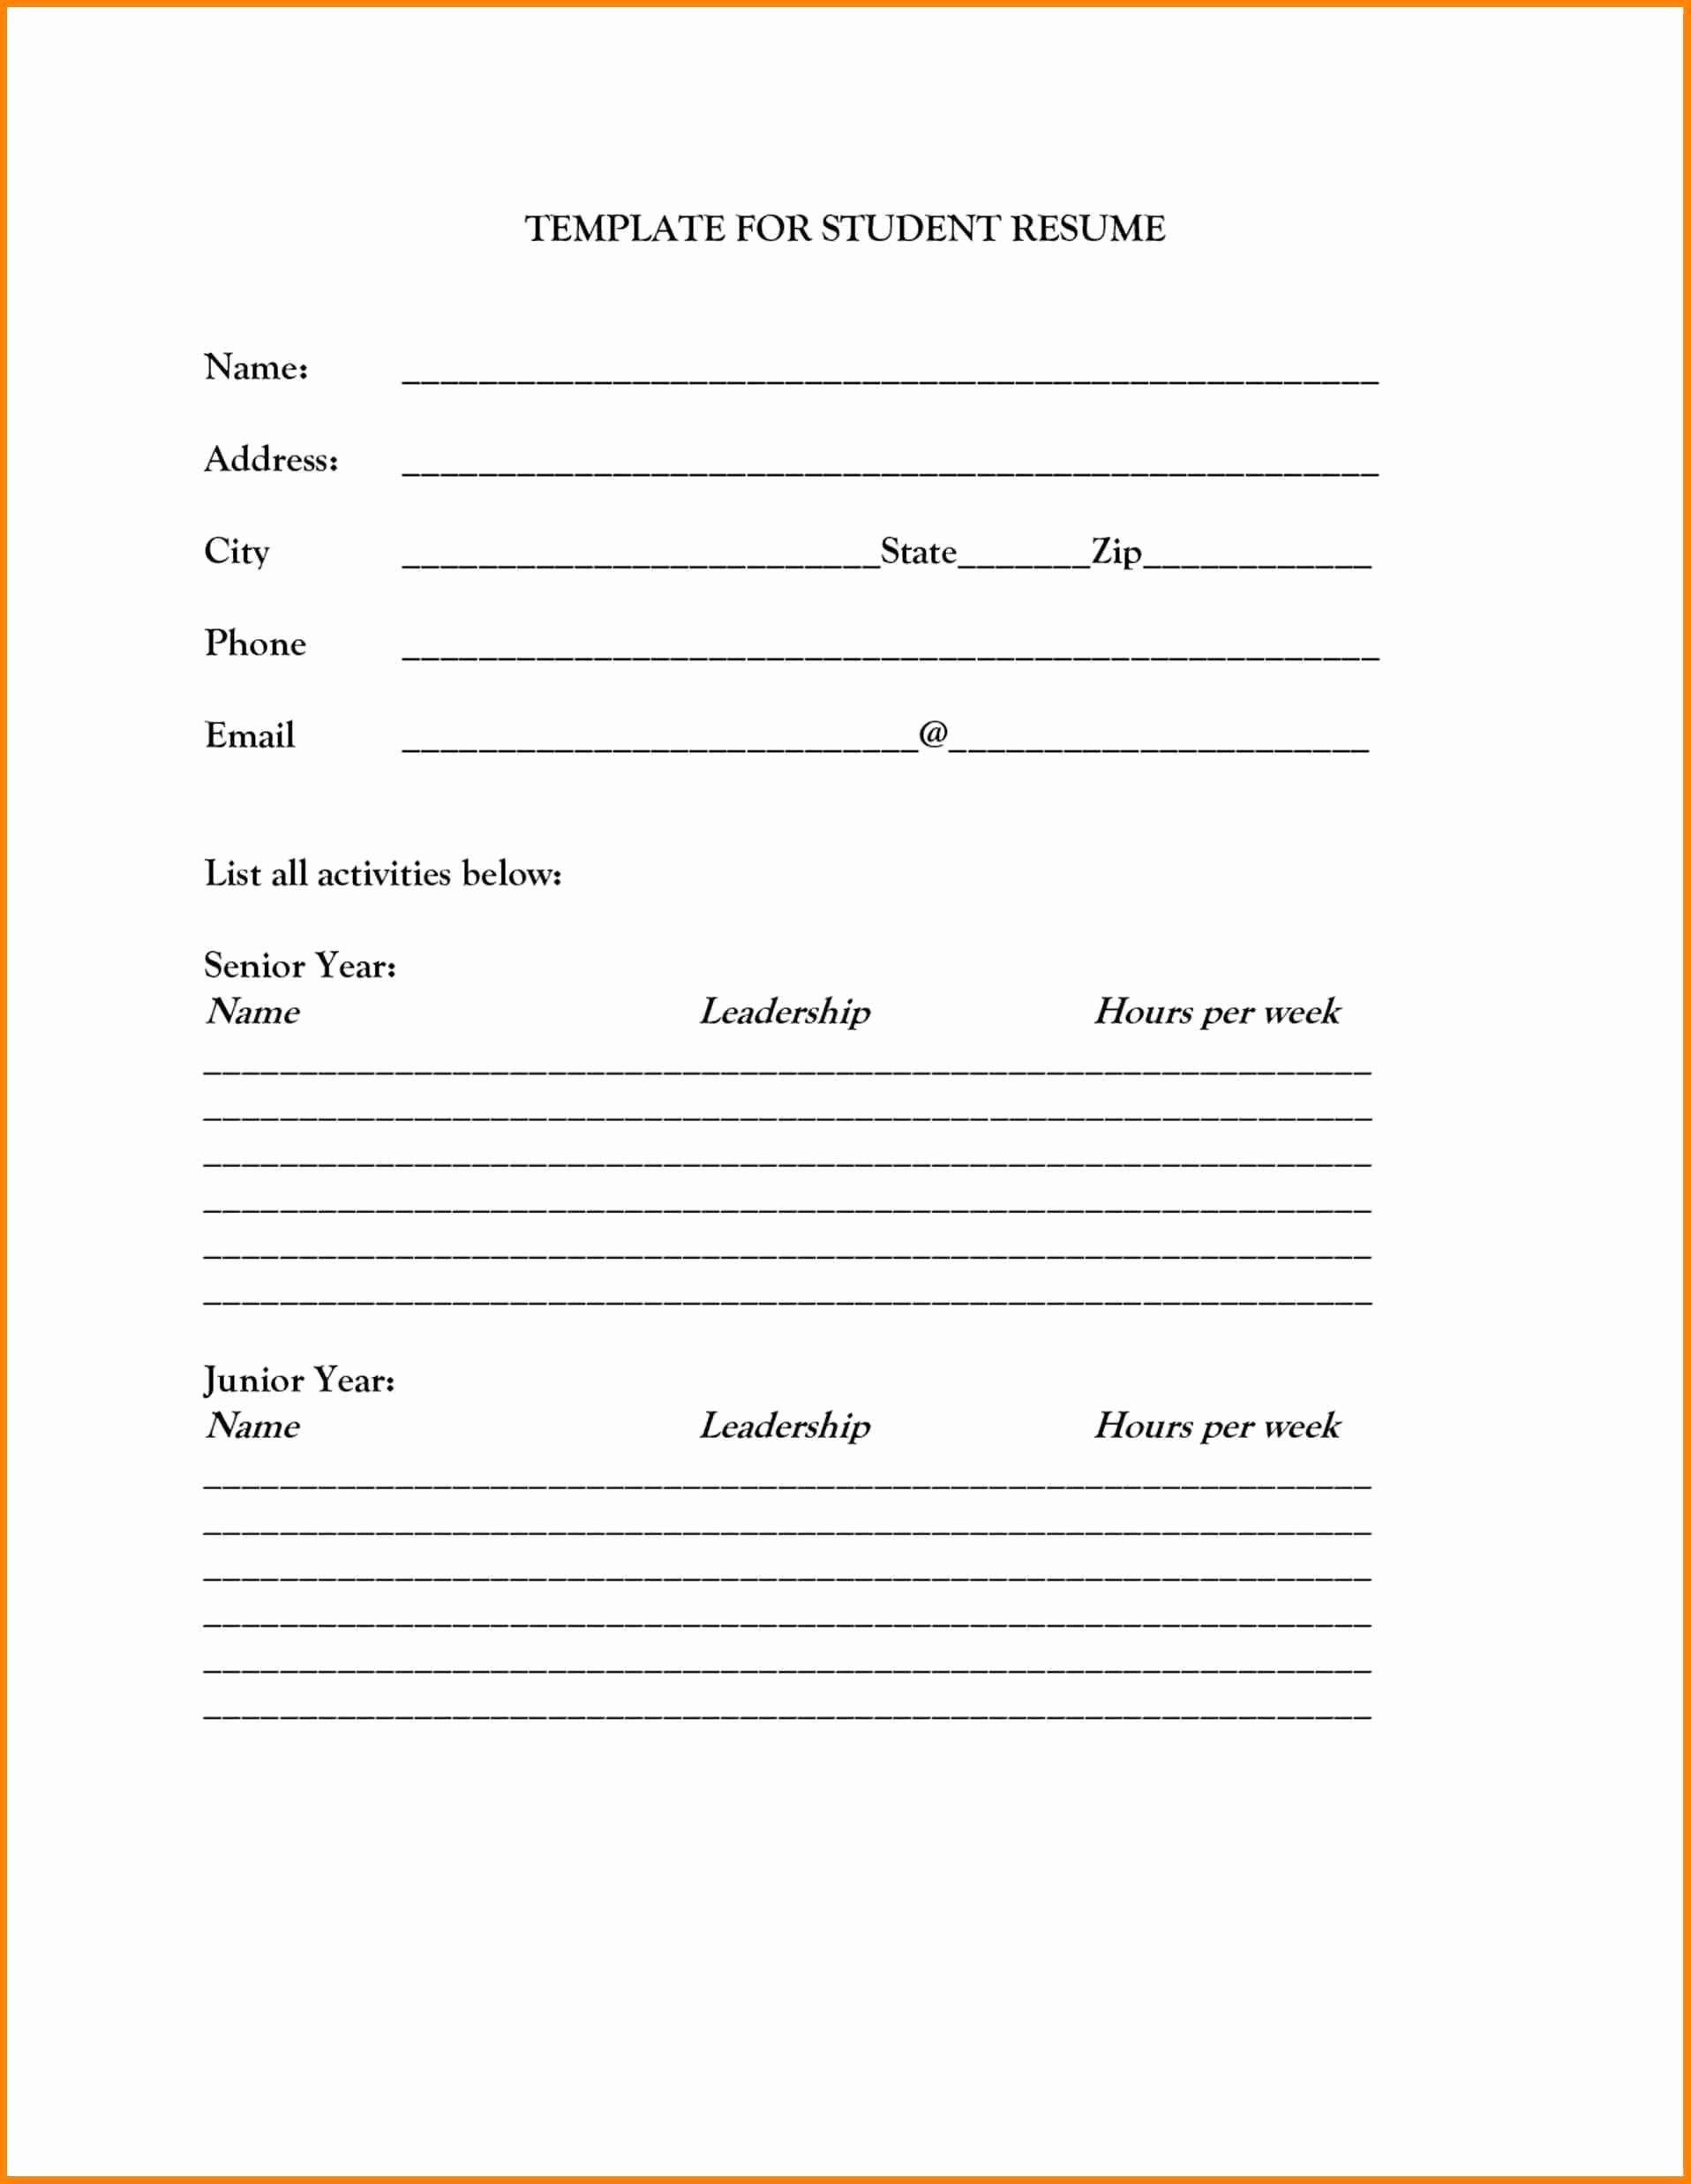 Free Printable Resume Templates Elegant Blank Resume Template Printable Free Printable Resume Templates Resume Form Cv Template Download